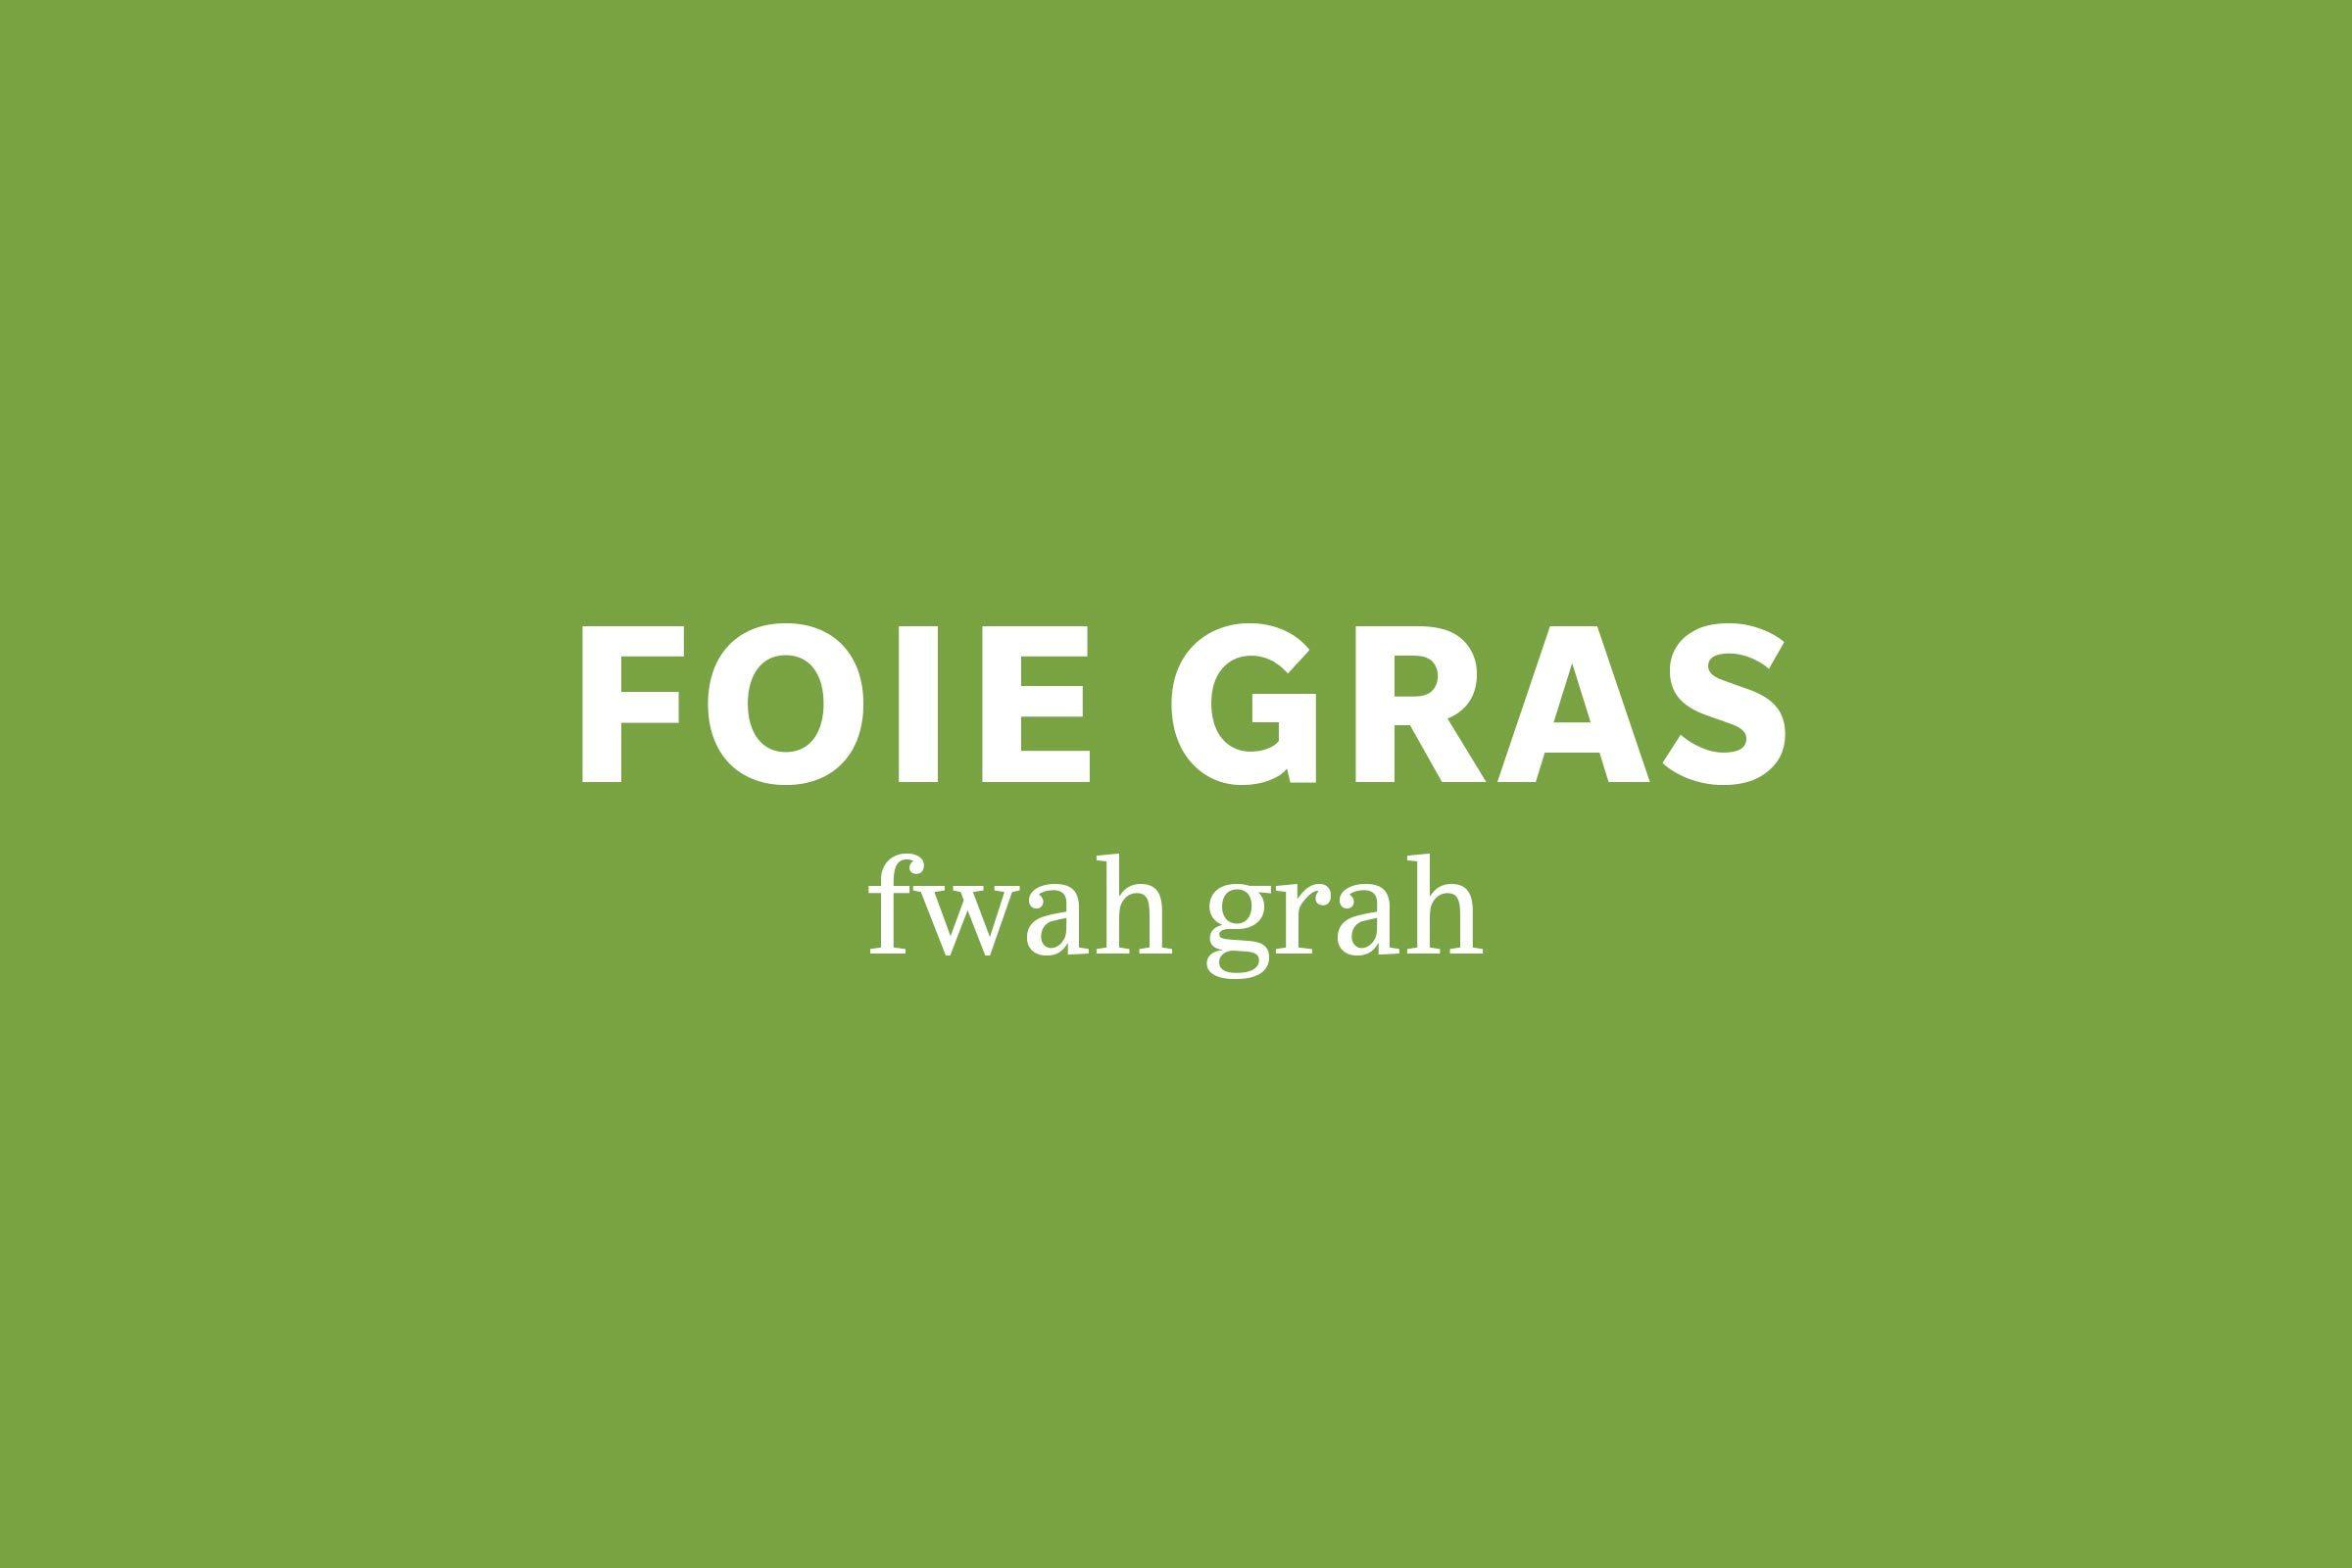 foie gras pronunciation